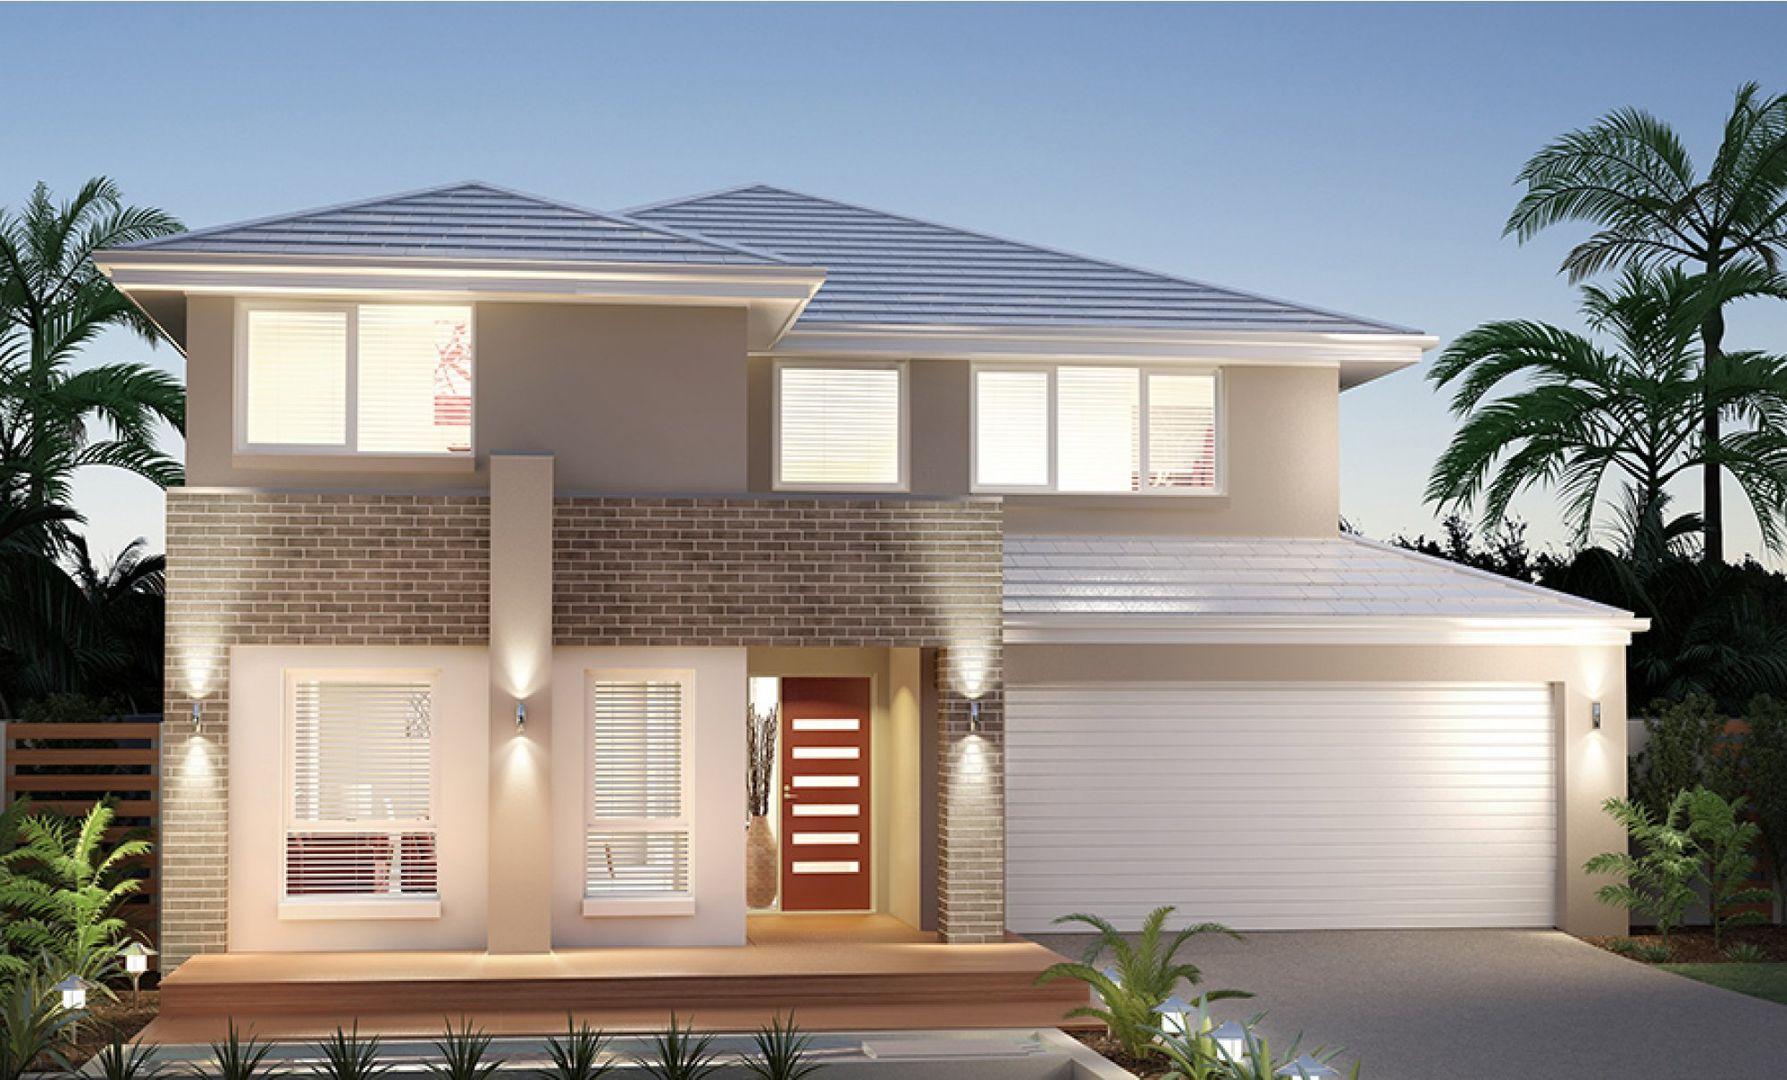 Lot 230 New Road, Ripley QLD 4306, Image 0